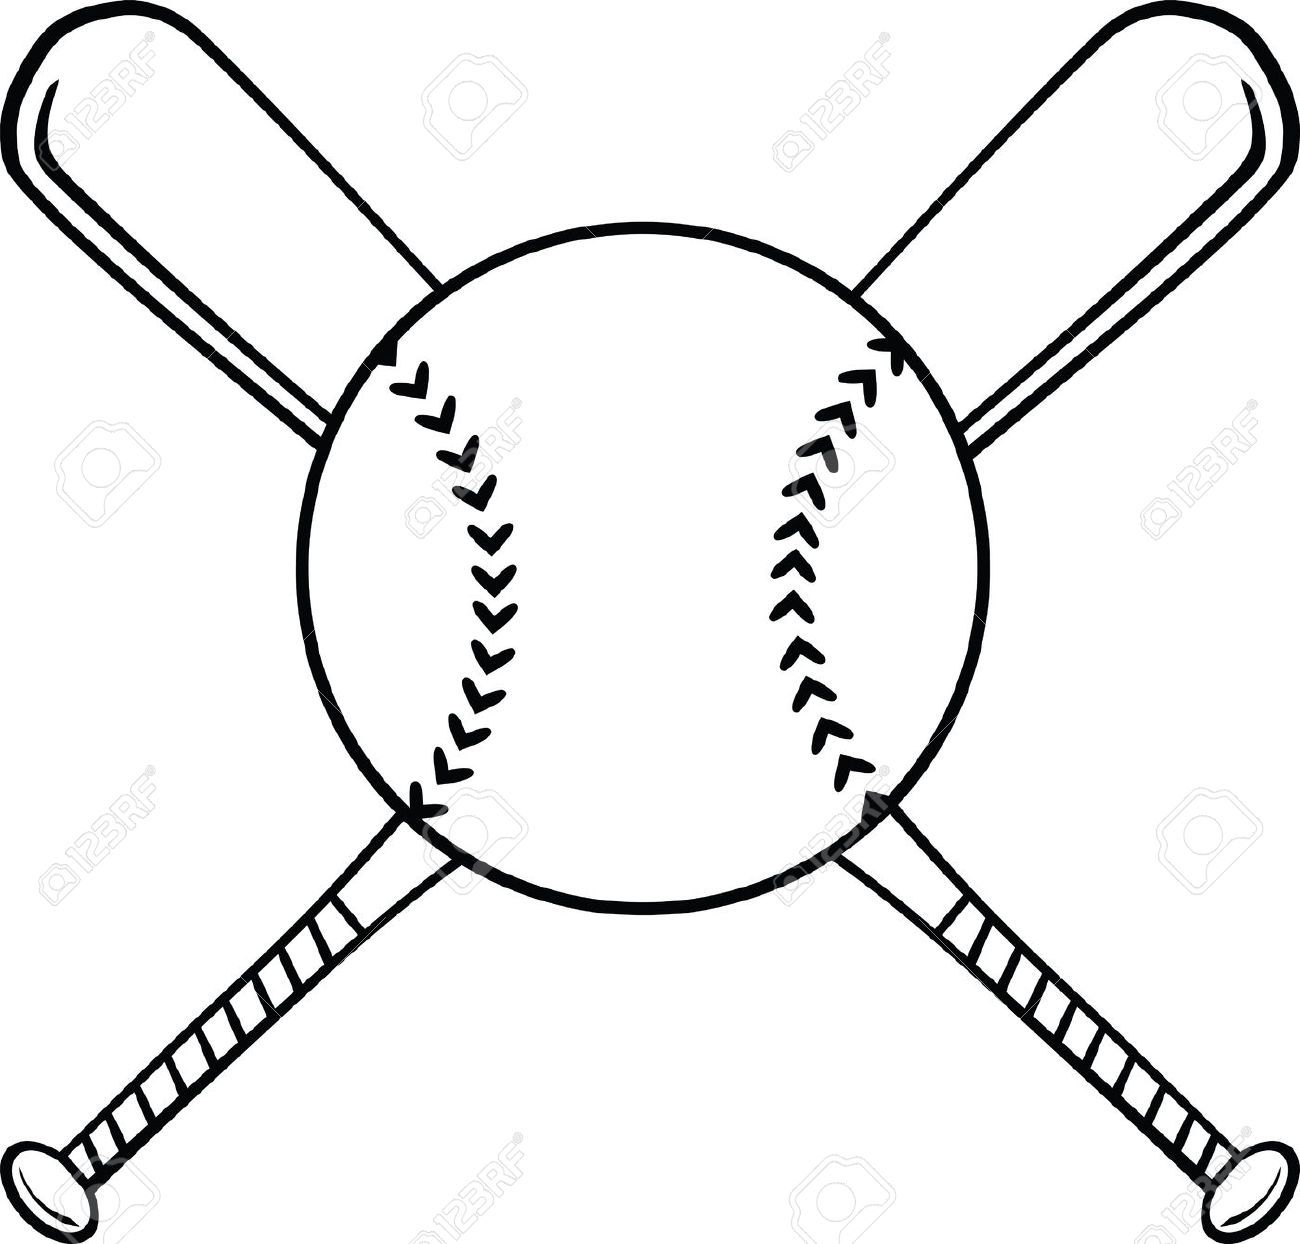 softball ball and bat clipart clipartfox [ 1300 x 1244 Pixel ]